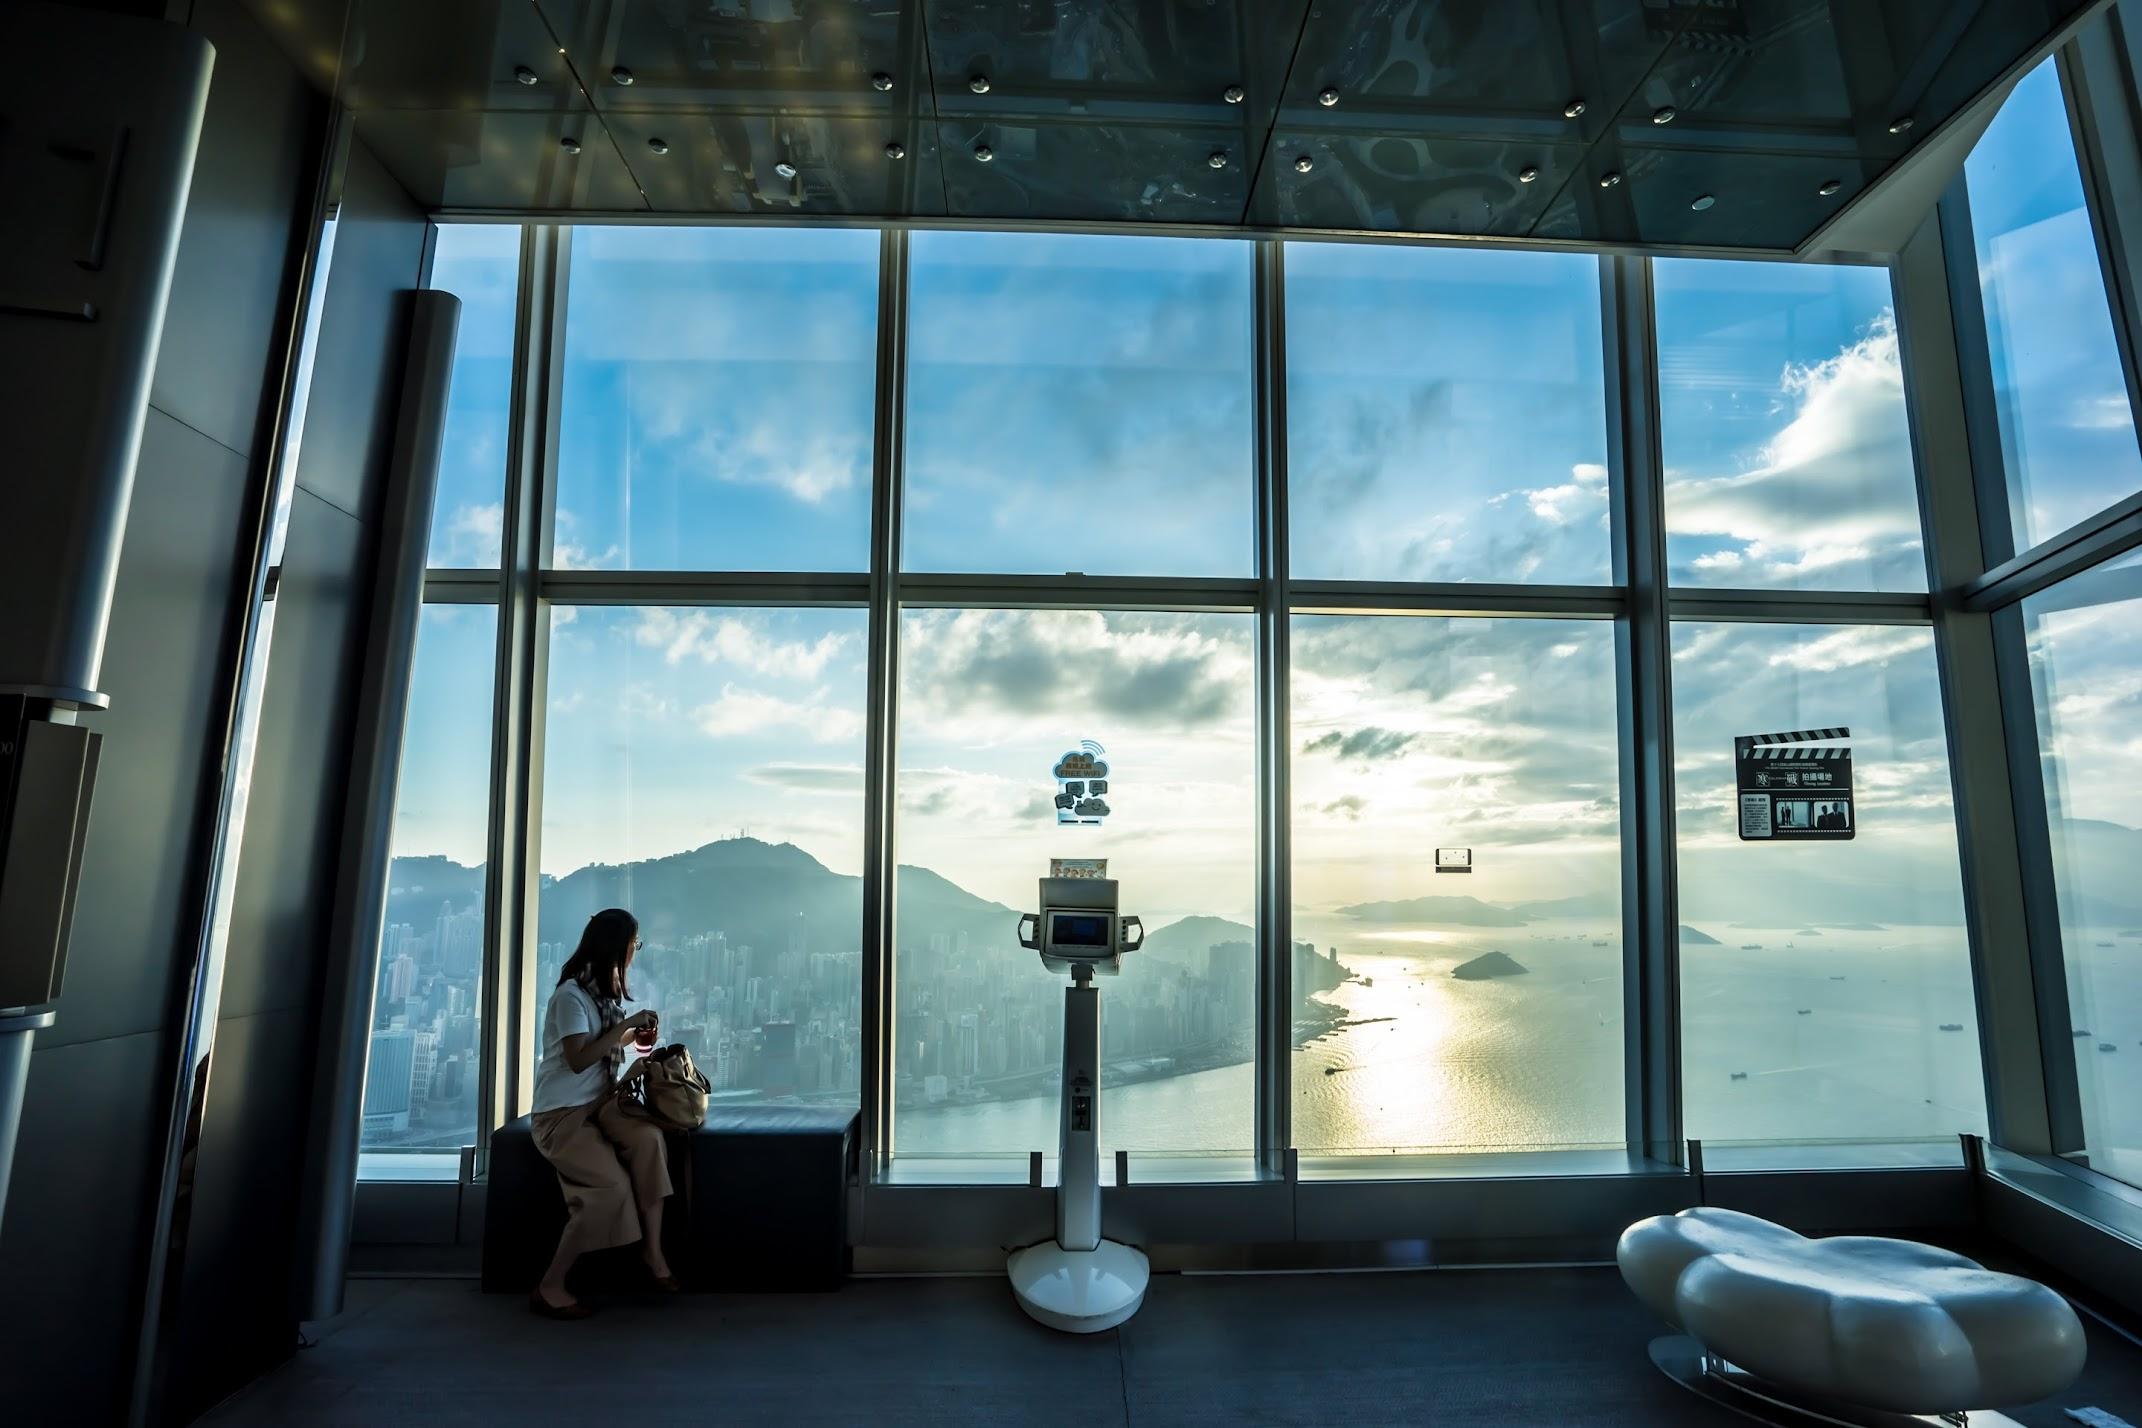 Hong Kong sky100 (天際100)8